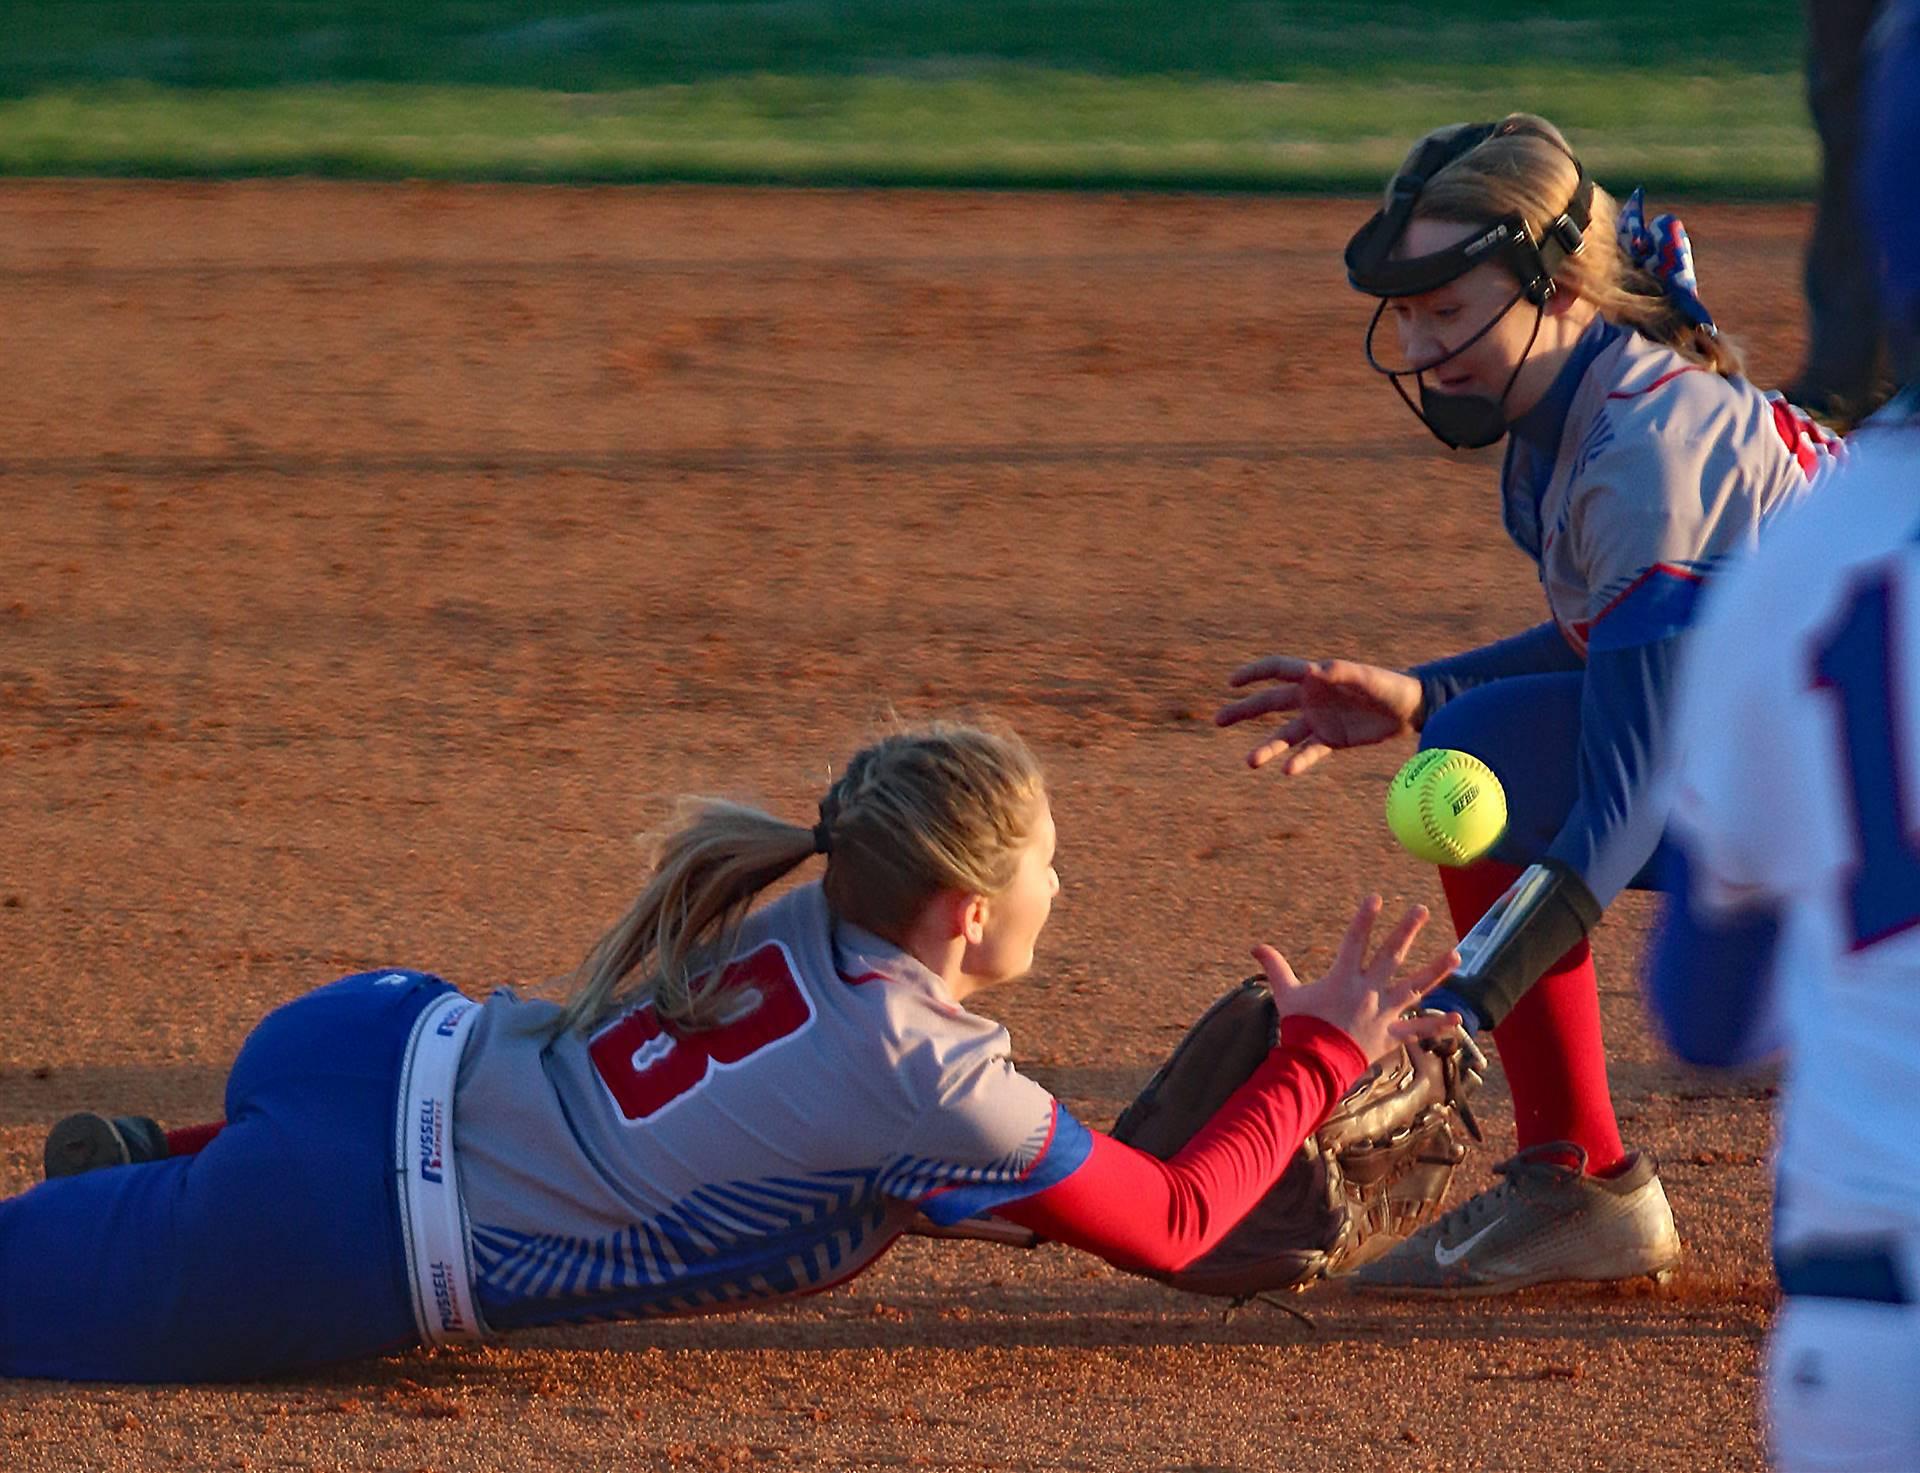 softball catch attempt